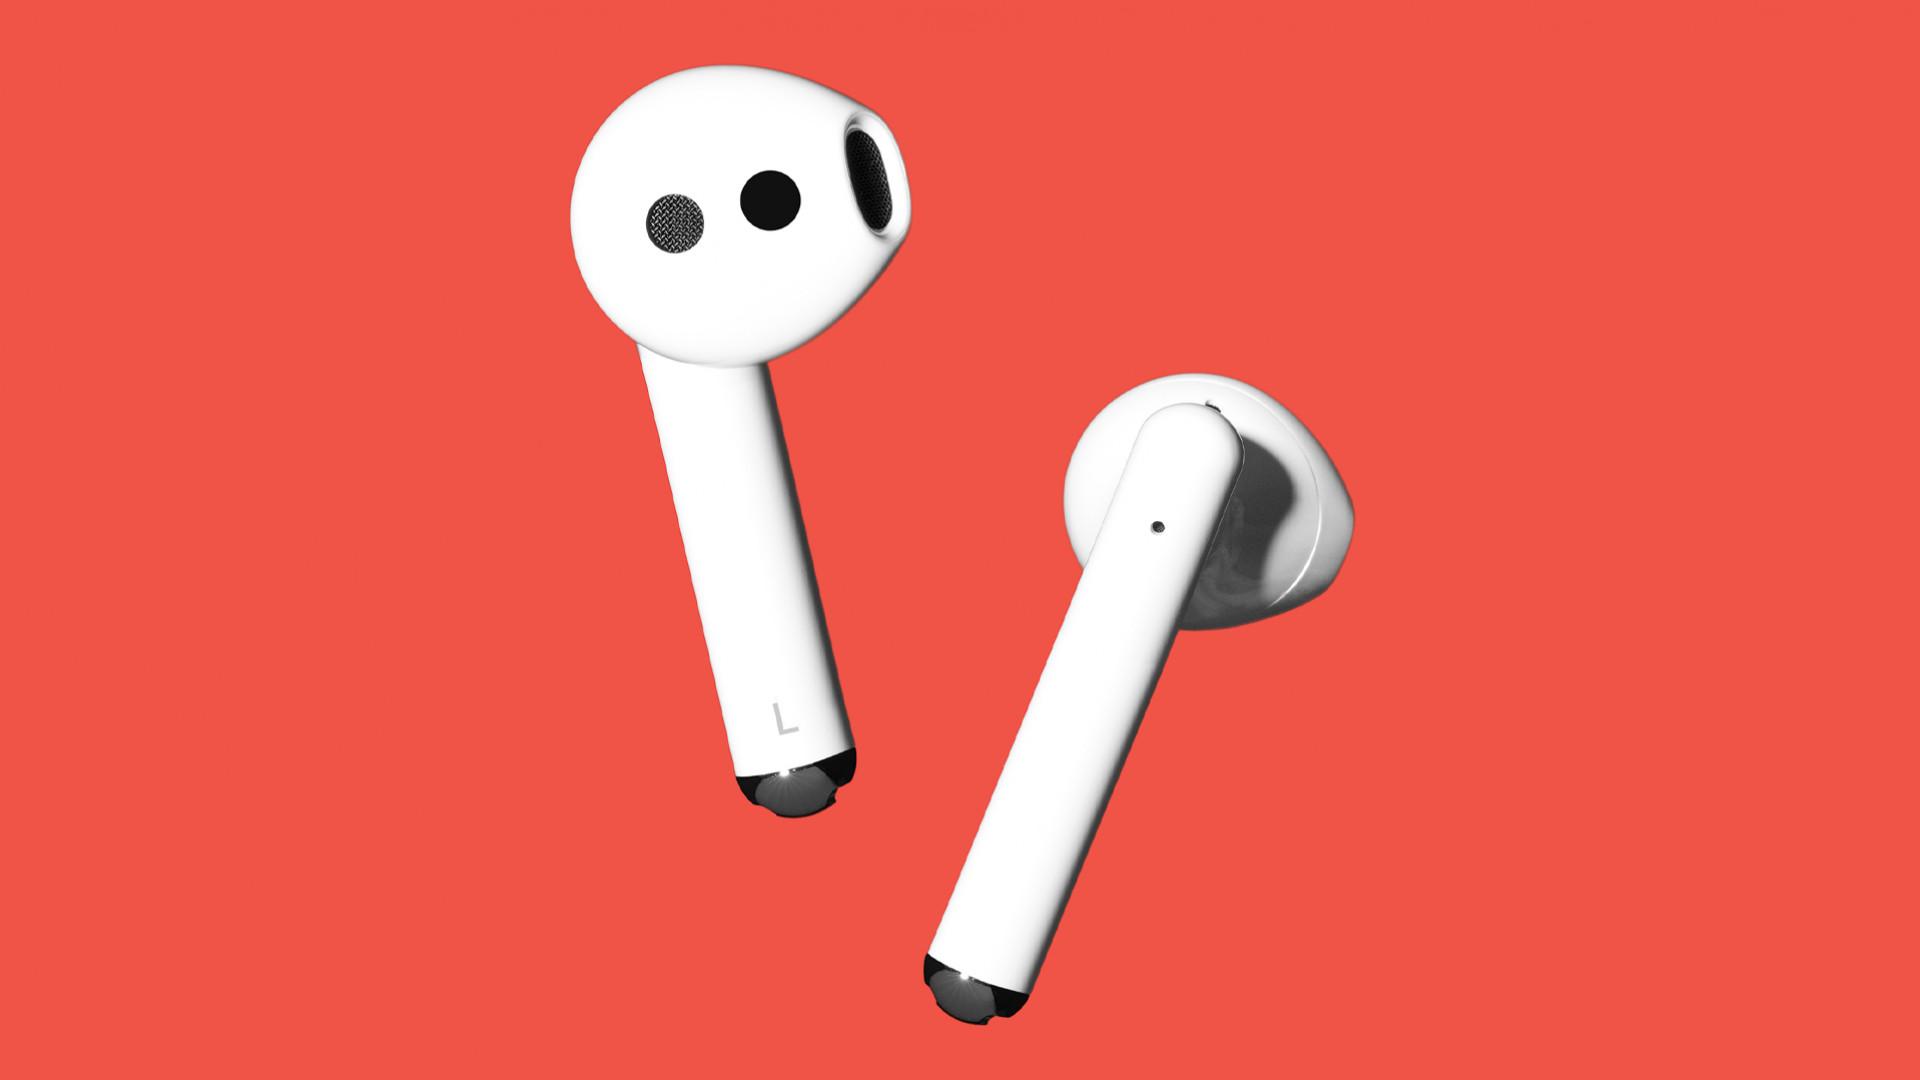 Huawei Freebuds 3 earbuds